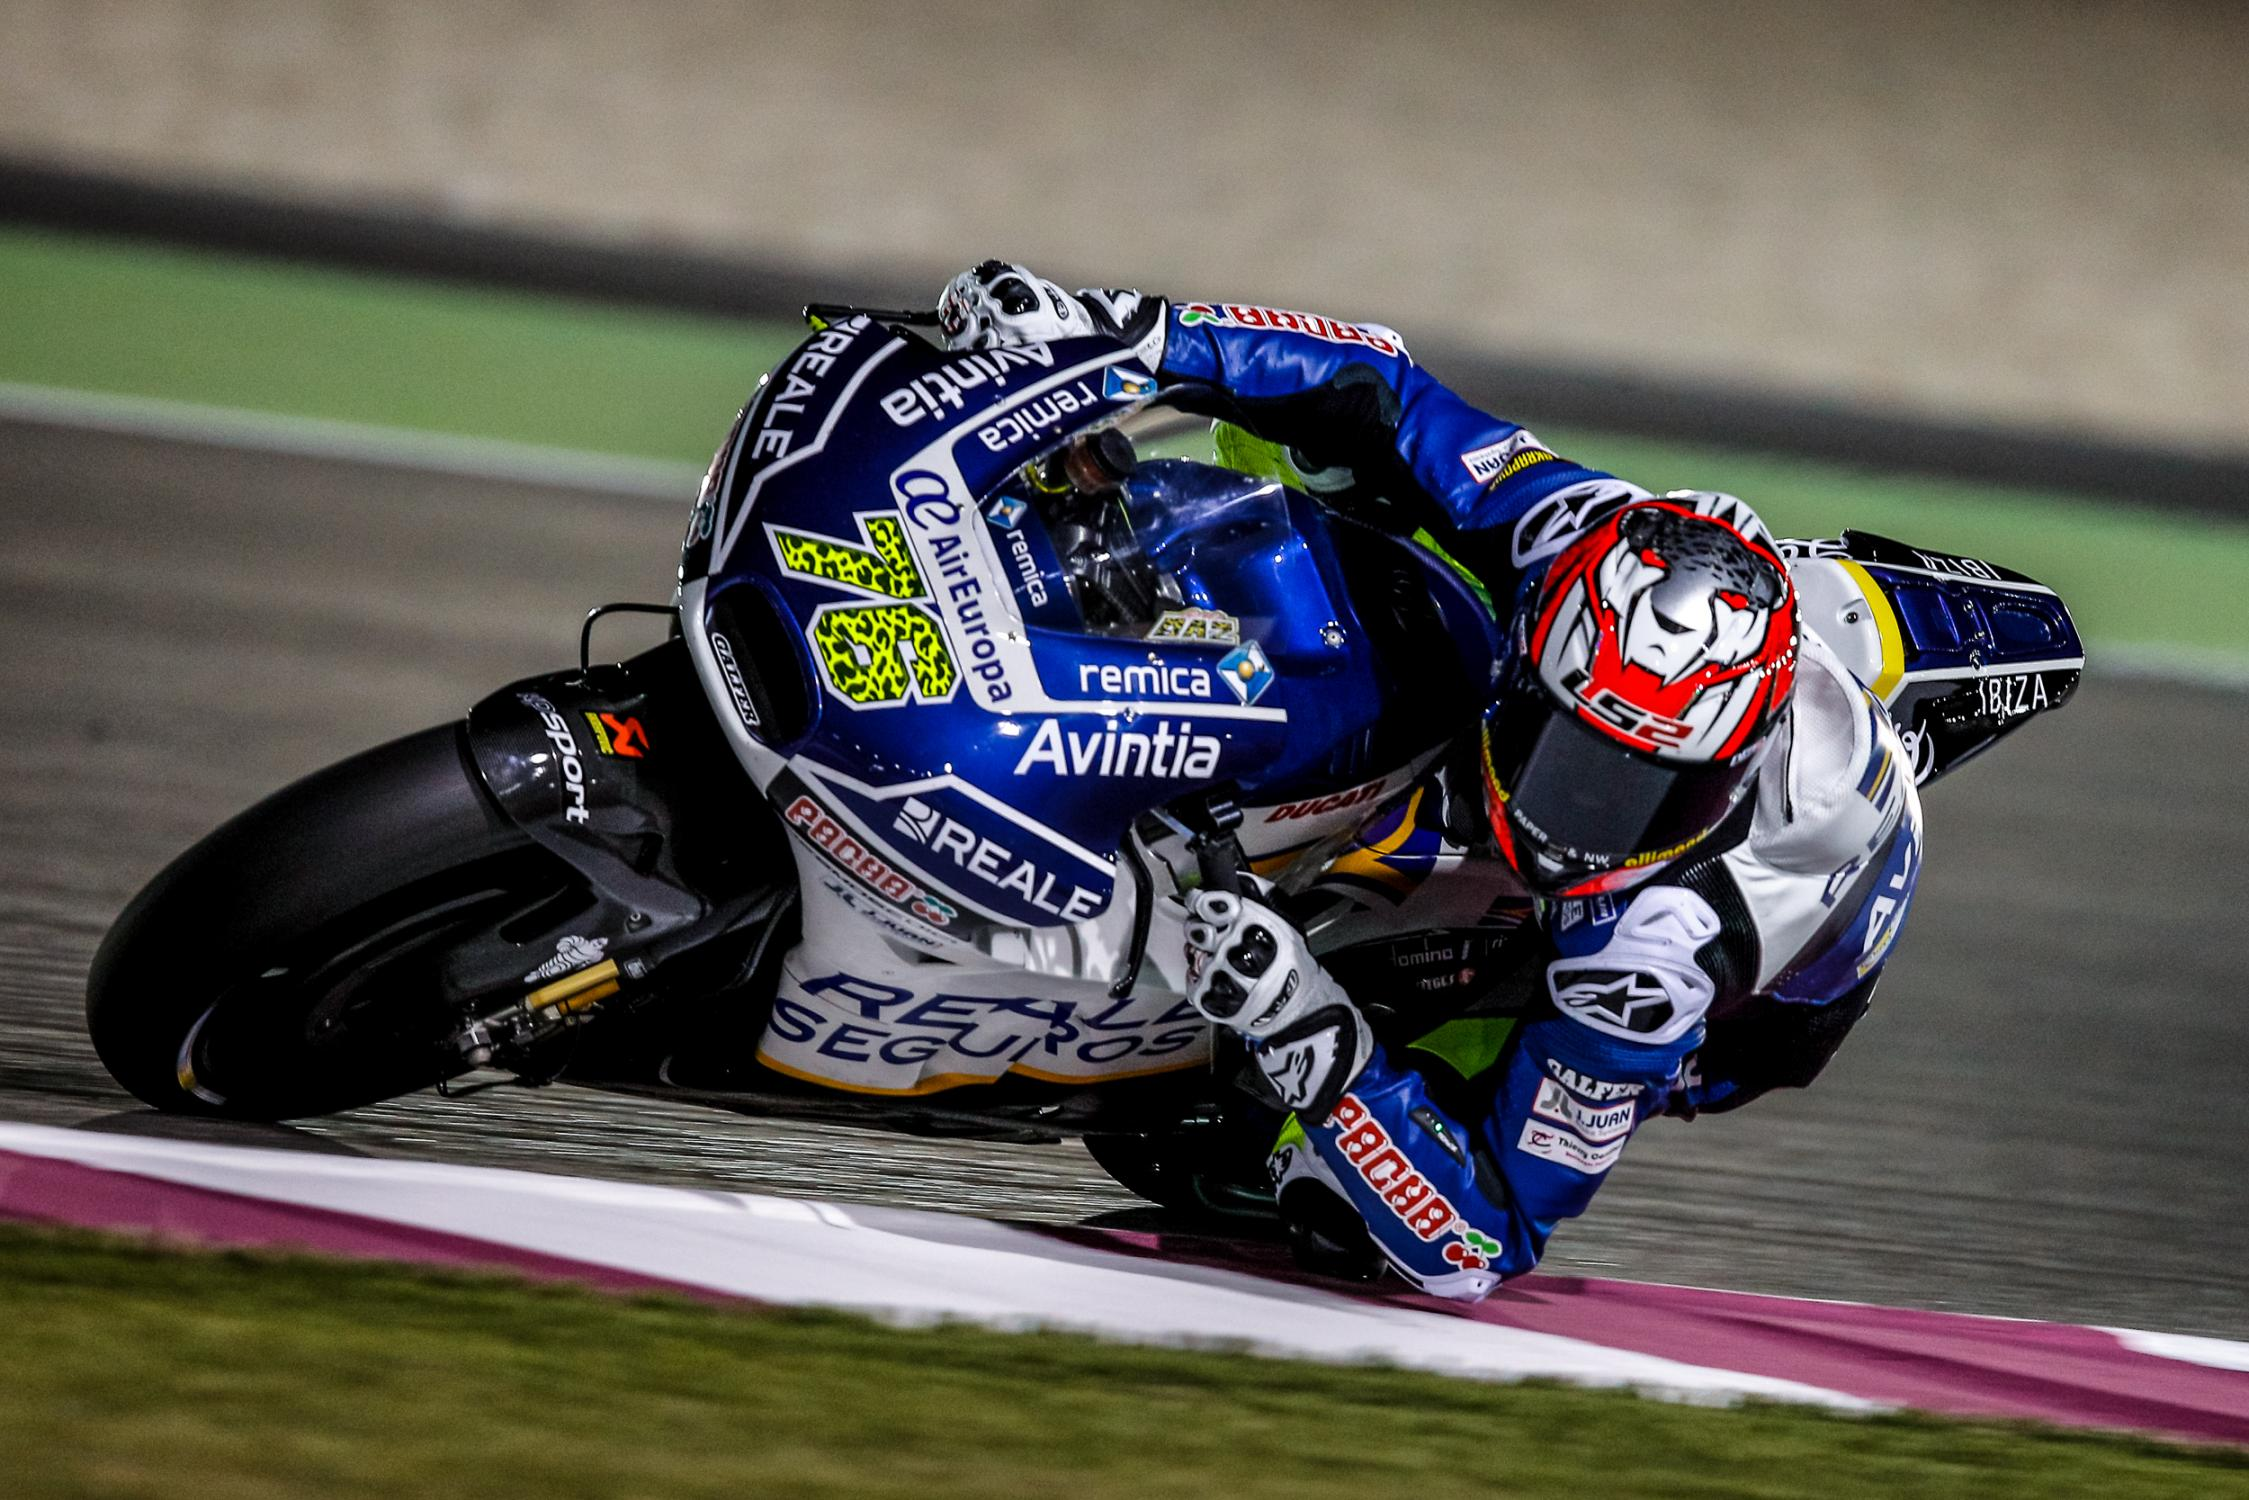 [MotoGP] Test Losail 76-loris-baz-fraclick.gallery_full_top_fullscreen